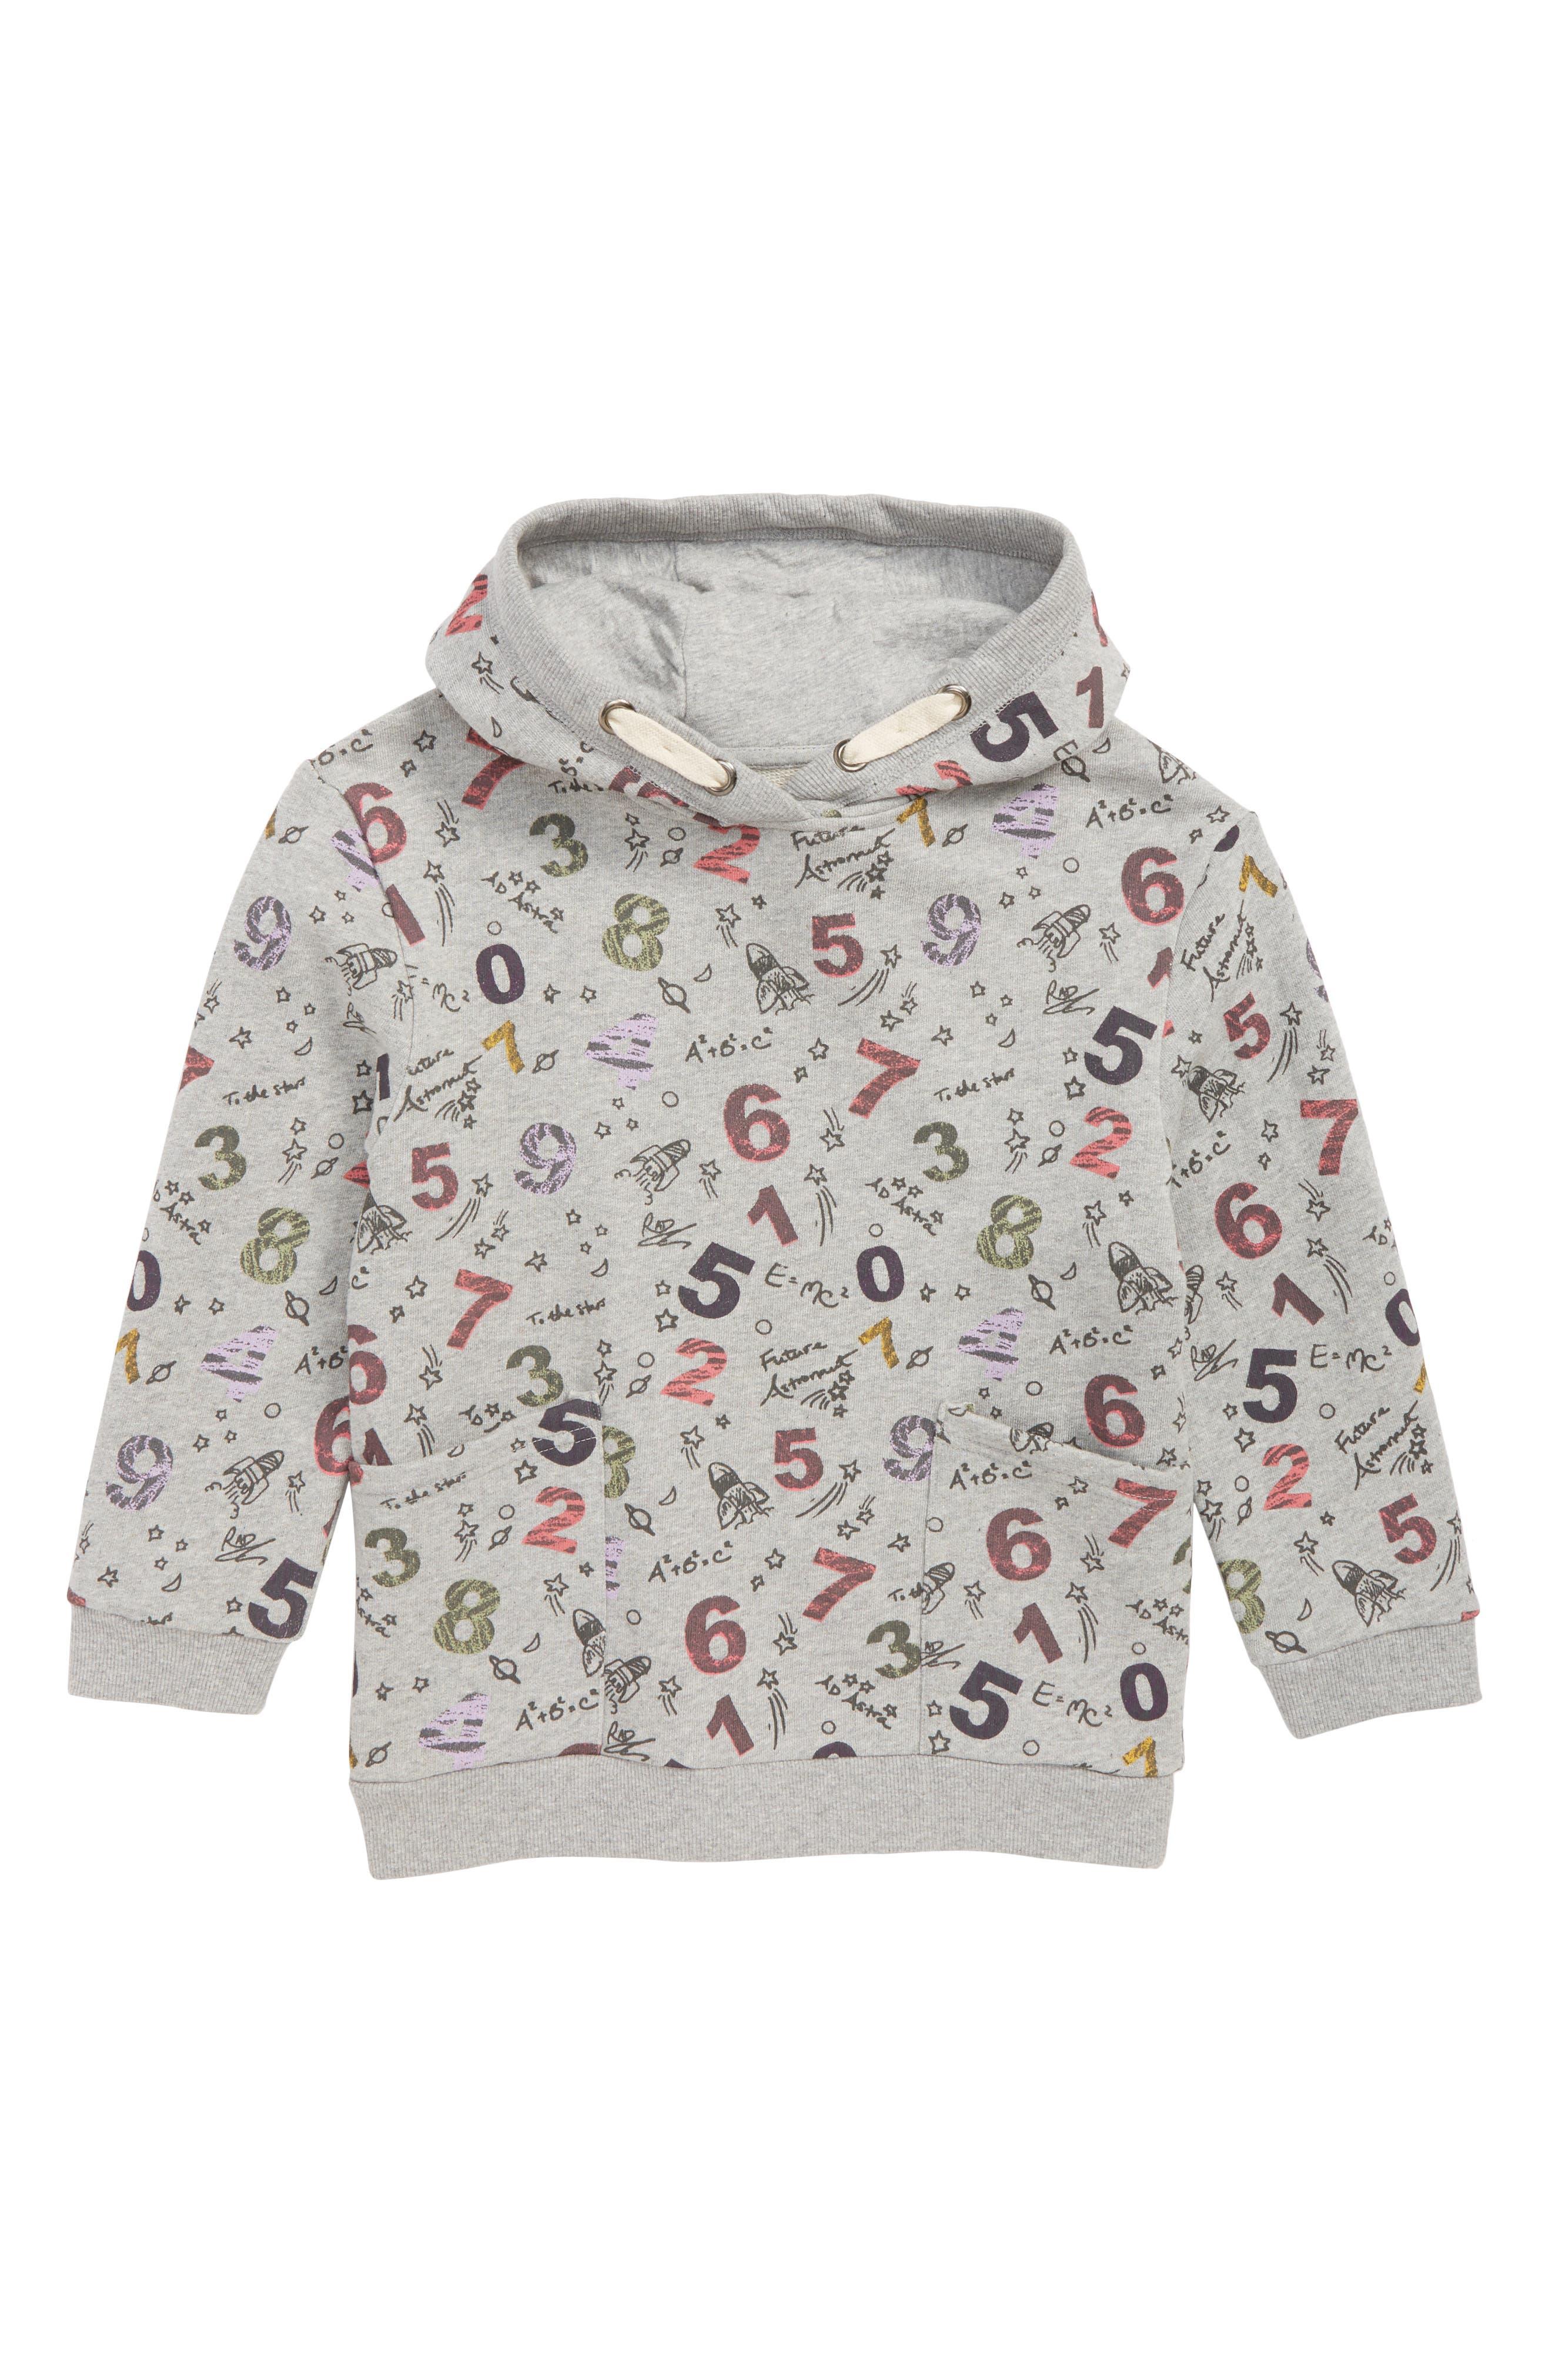 Numbers Graphic Sweatshirt,                         Main,                         color, 031